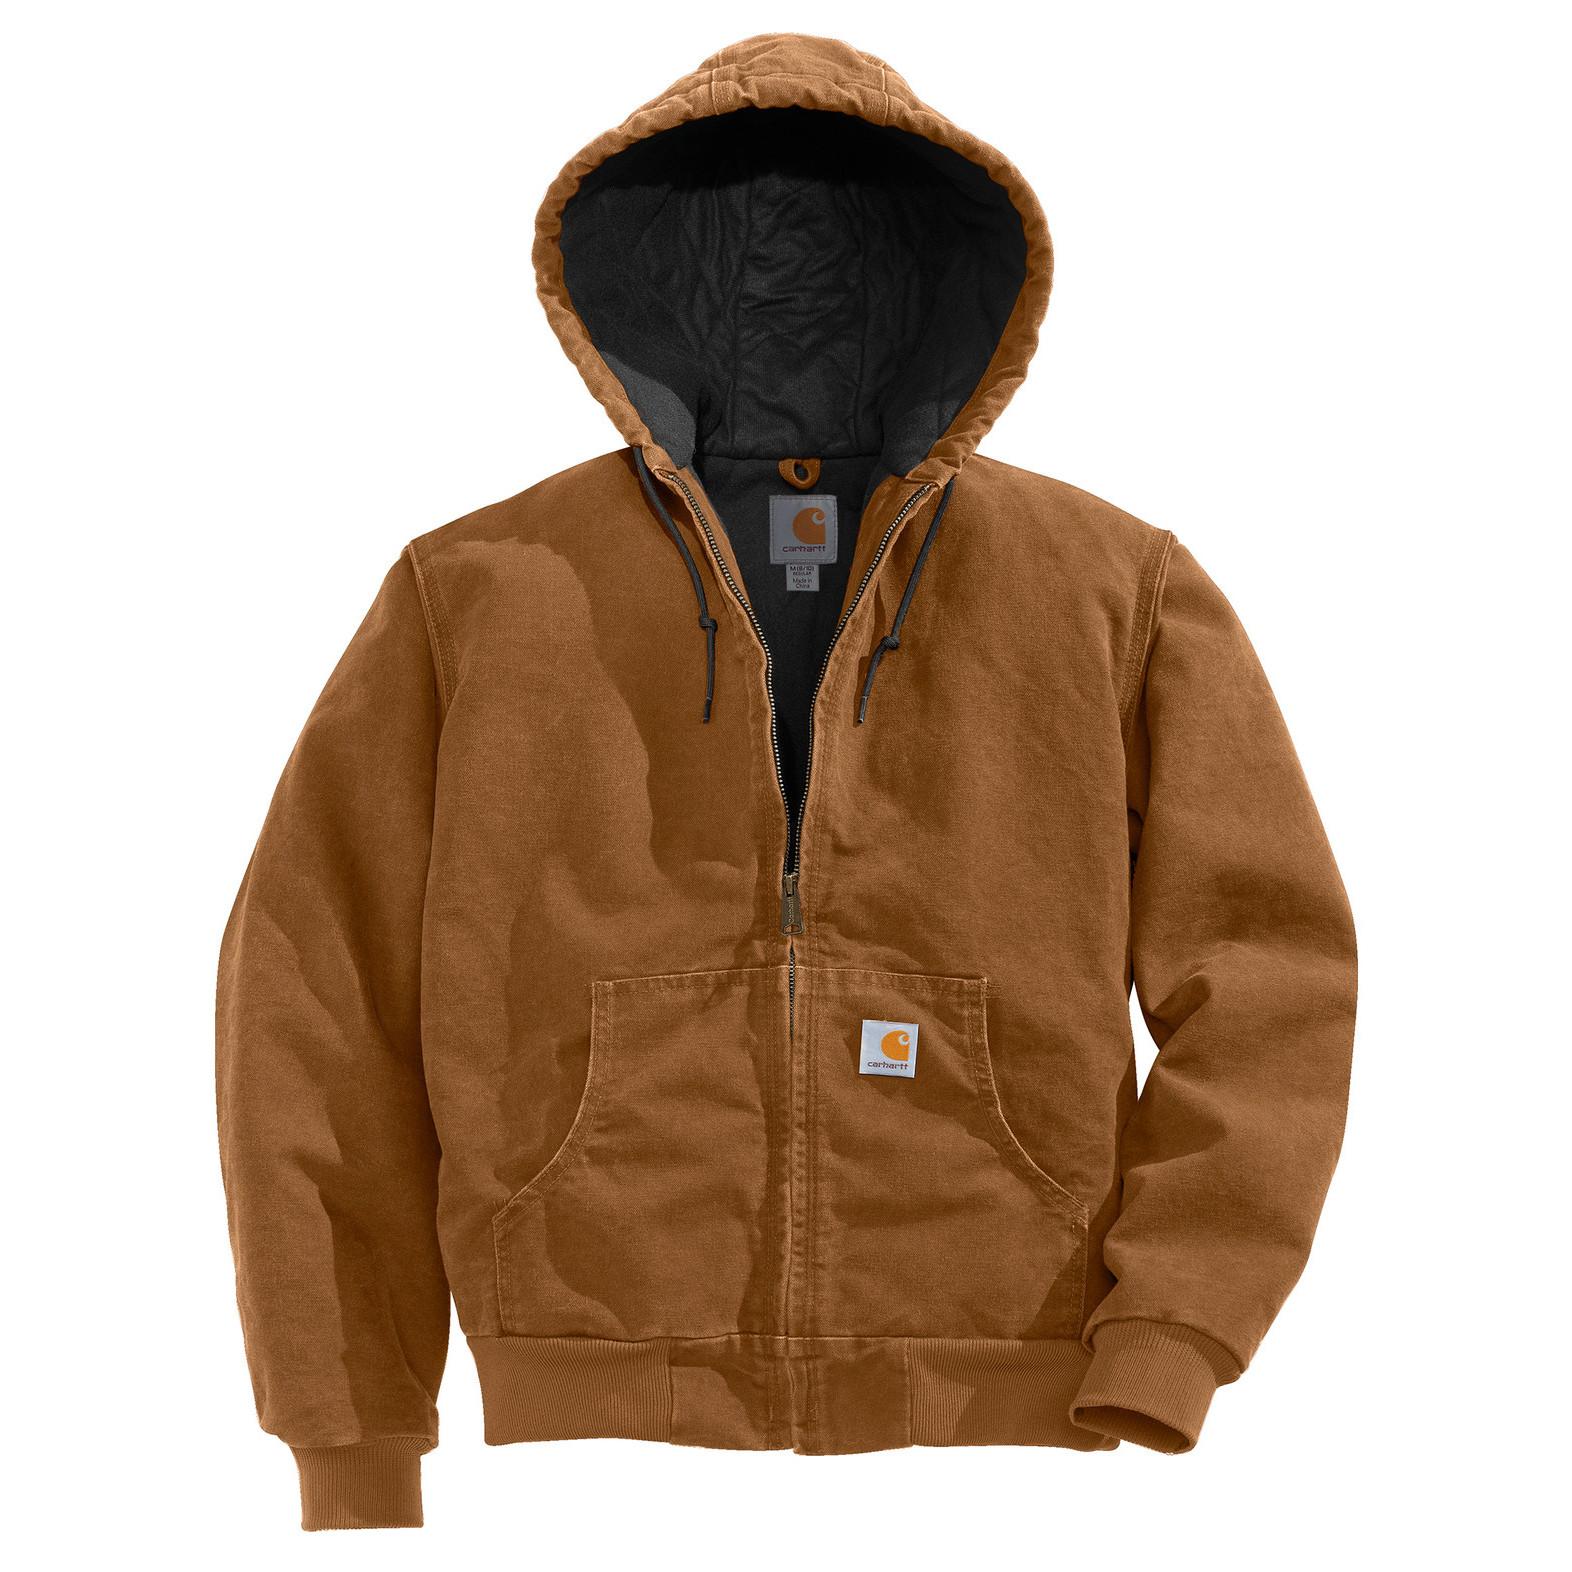 Куртка-кенгуру Carhartt Sandstone Active Jacket - J130 (Carhartt Brown, XL)